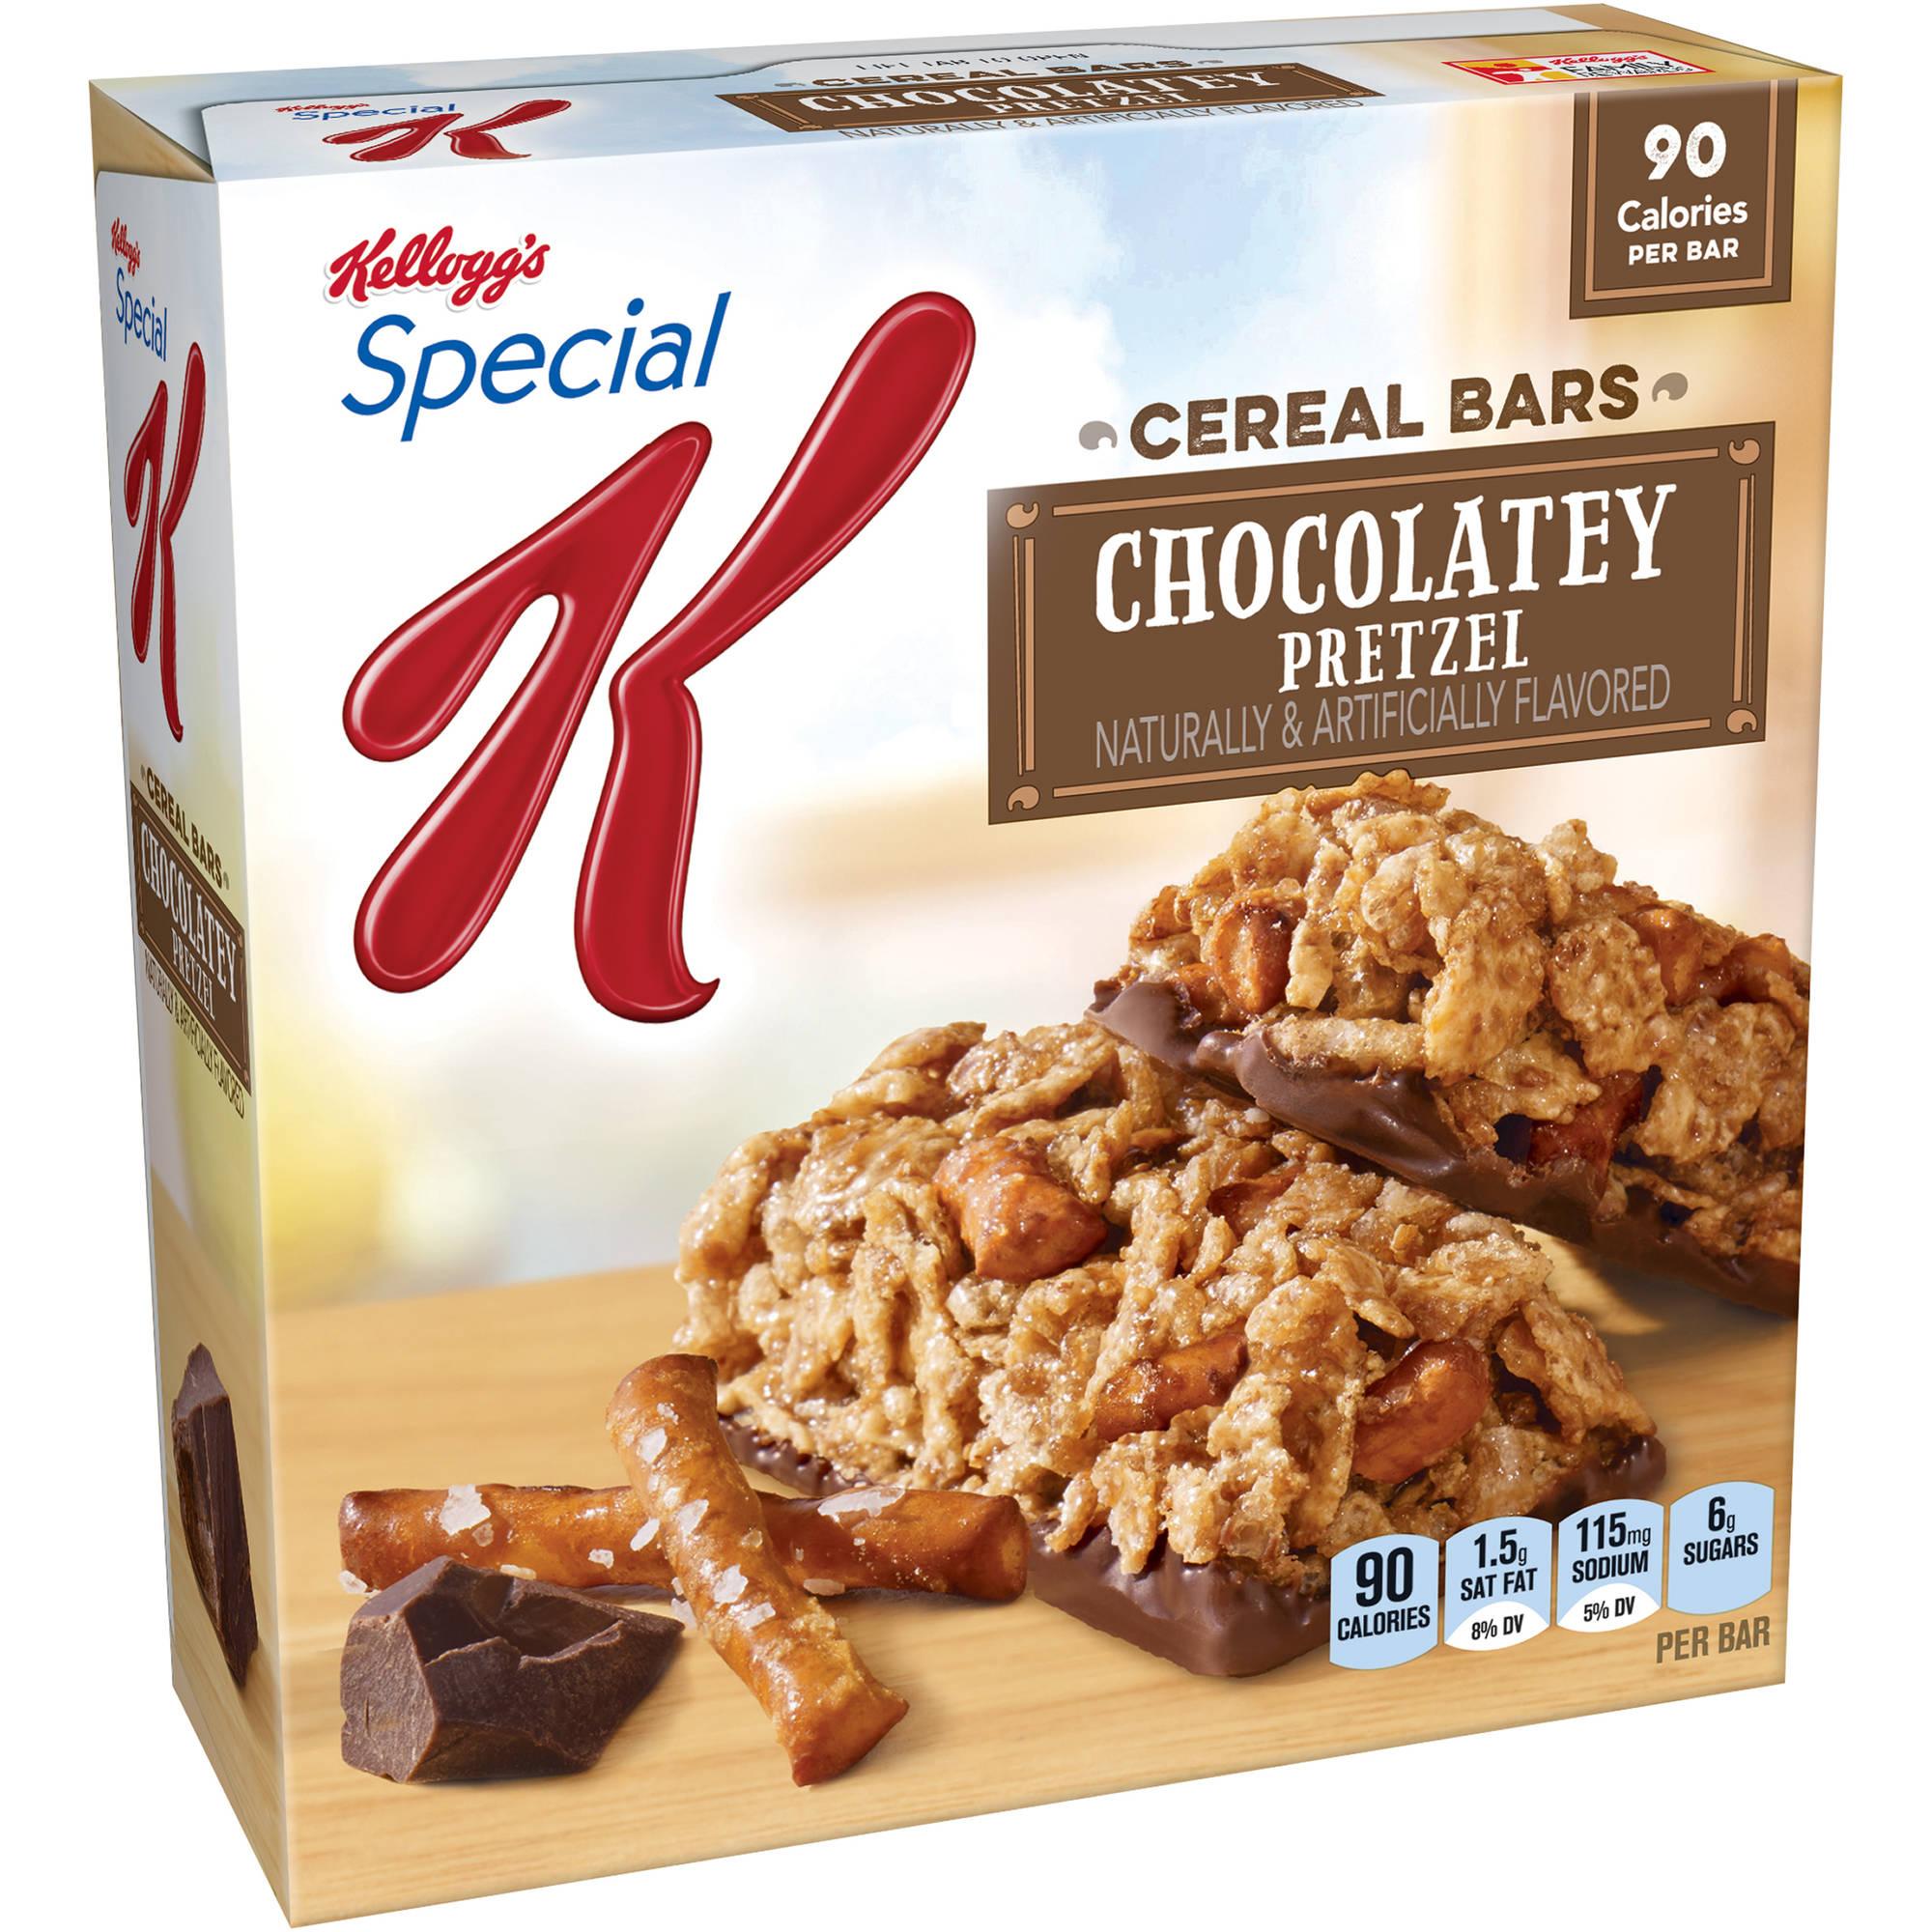 Kellogg's Special K Chocolatey Pretzel Cereal Bars, 6 count, 4.6 oz